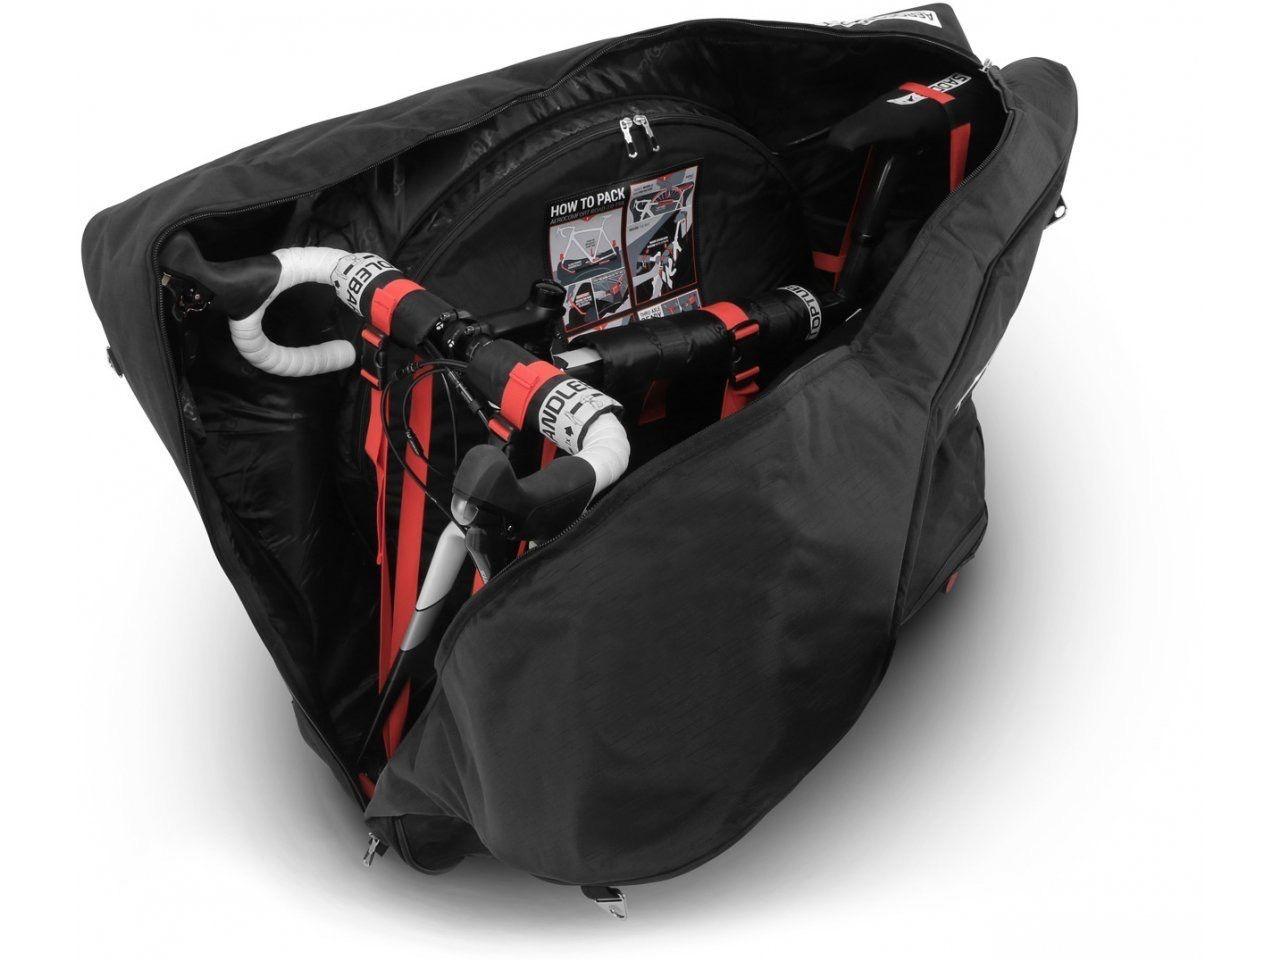 Scicon AeroComfort 2.0 bike bag